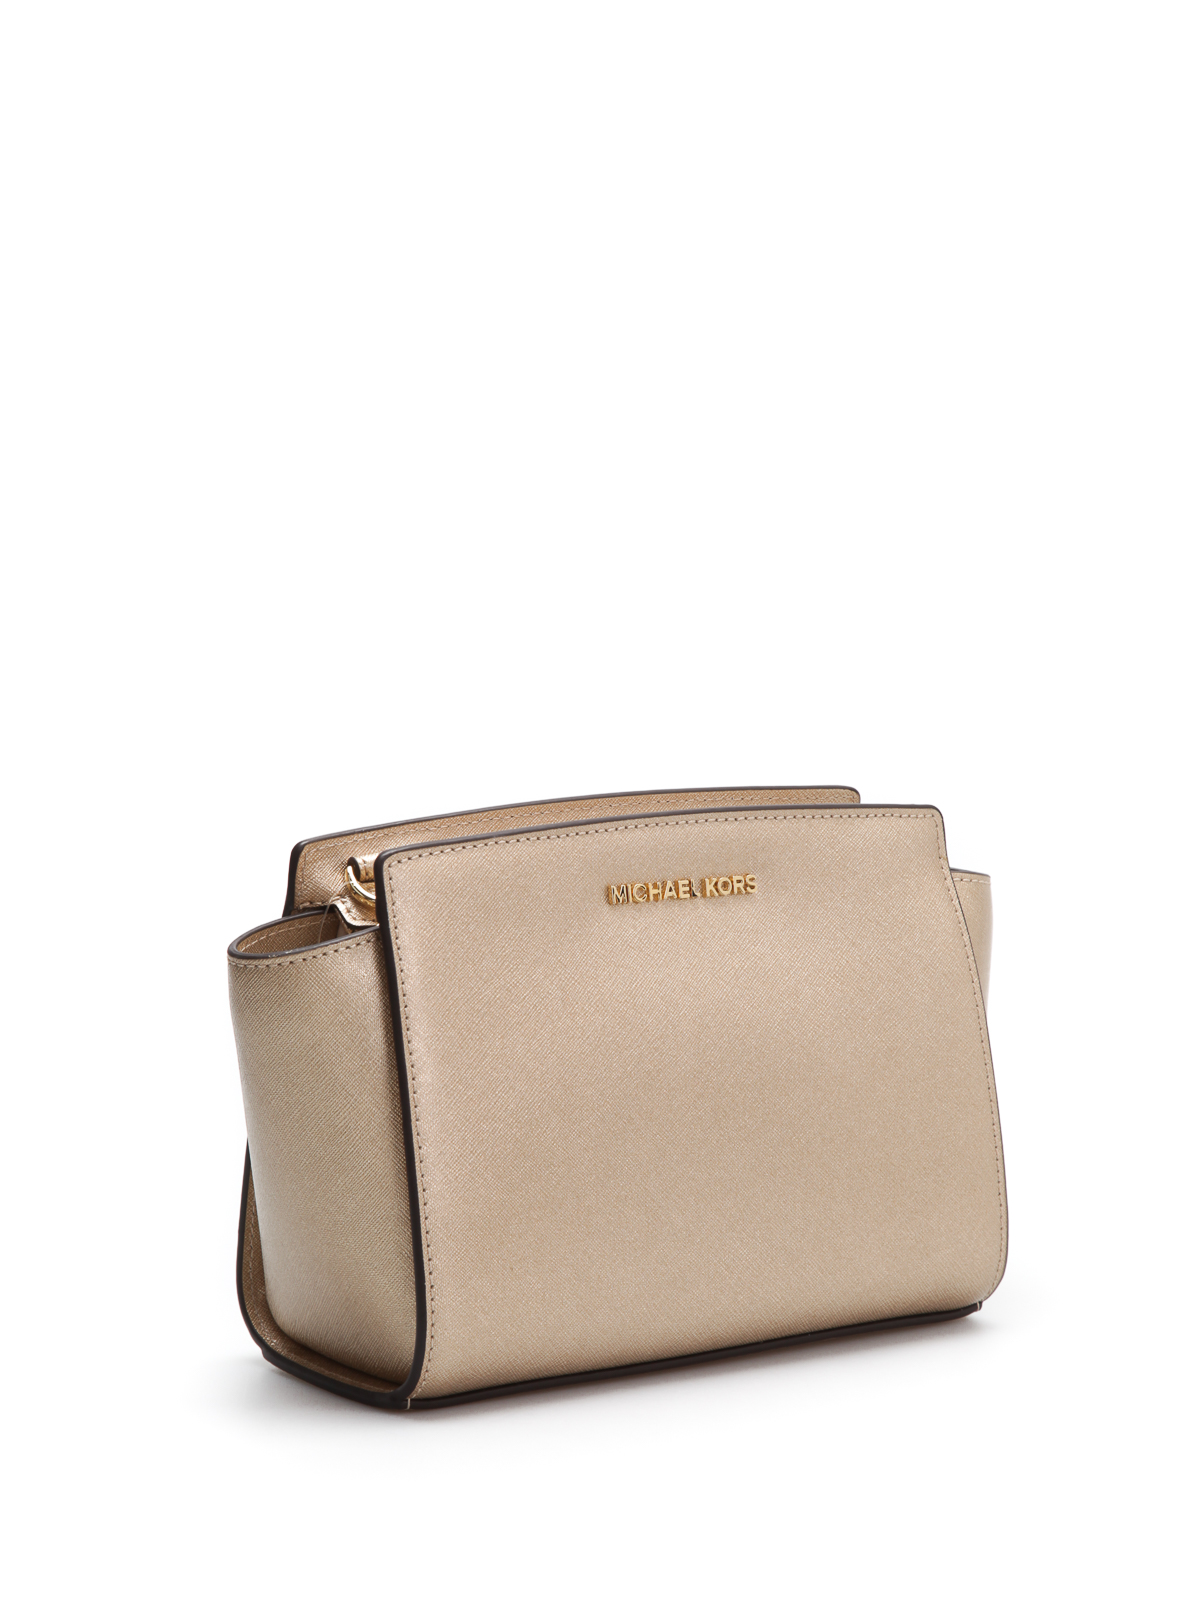 MICHAEL KORS  shoulder bags online - Selma medium leather messenger 63977ff43f7